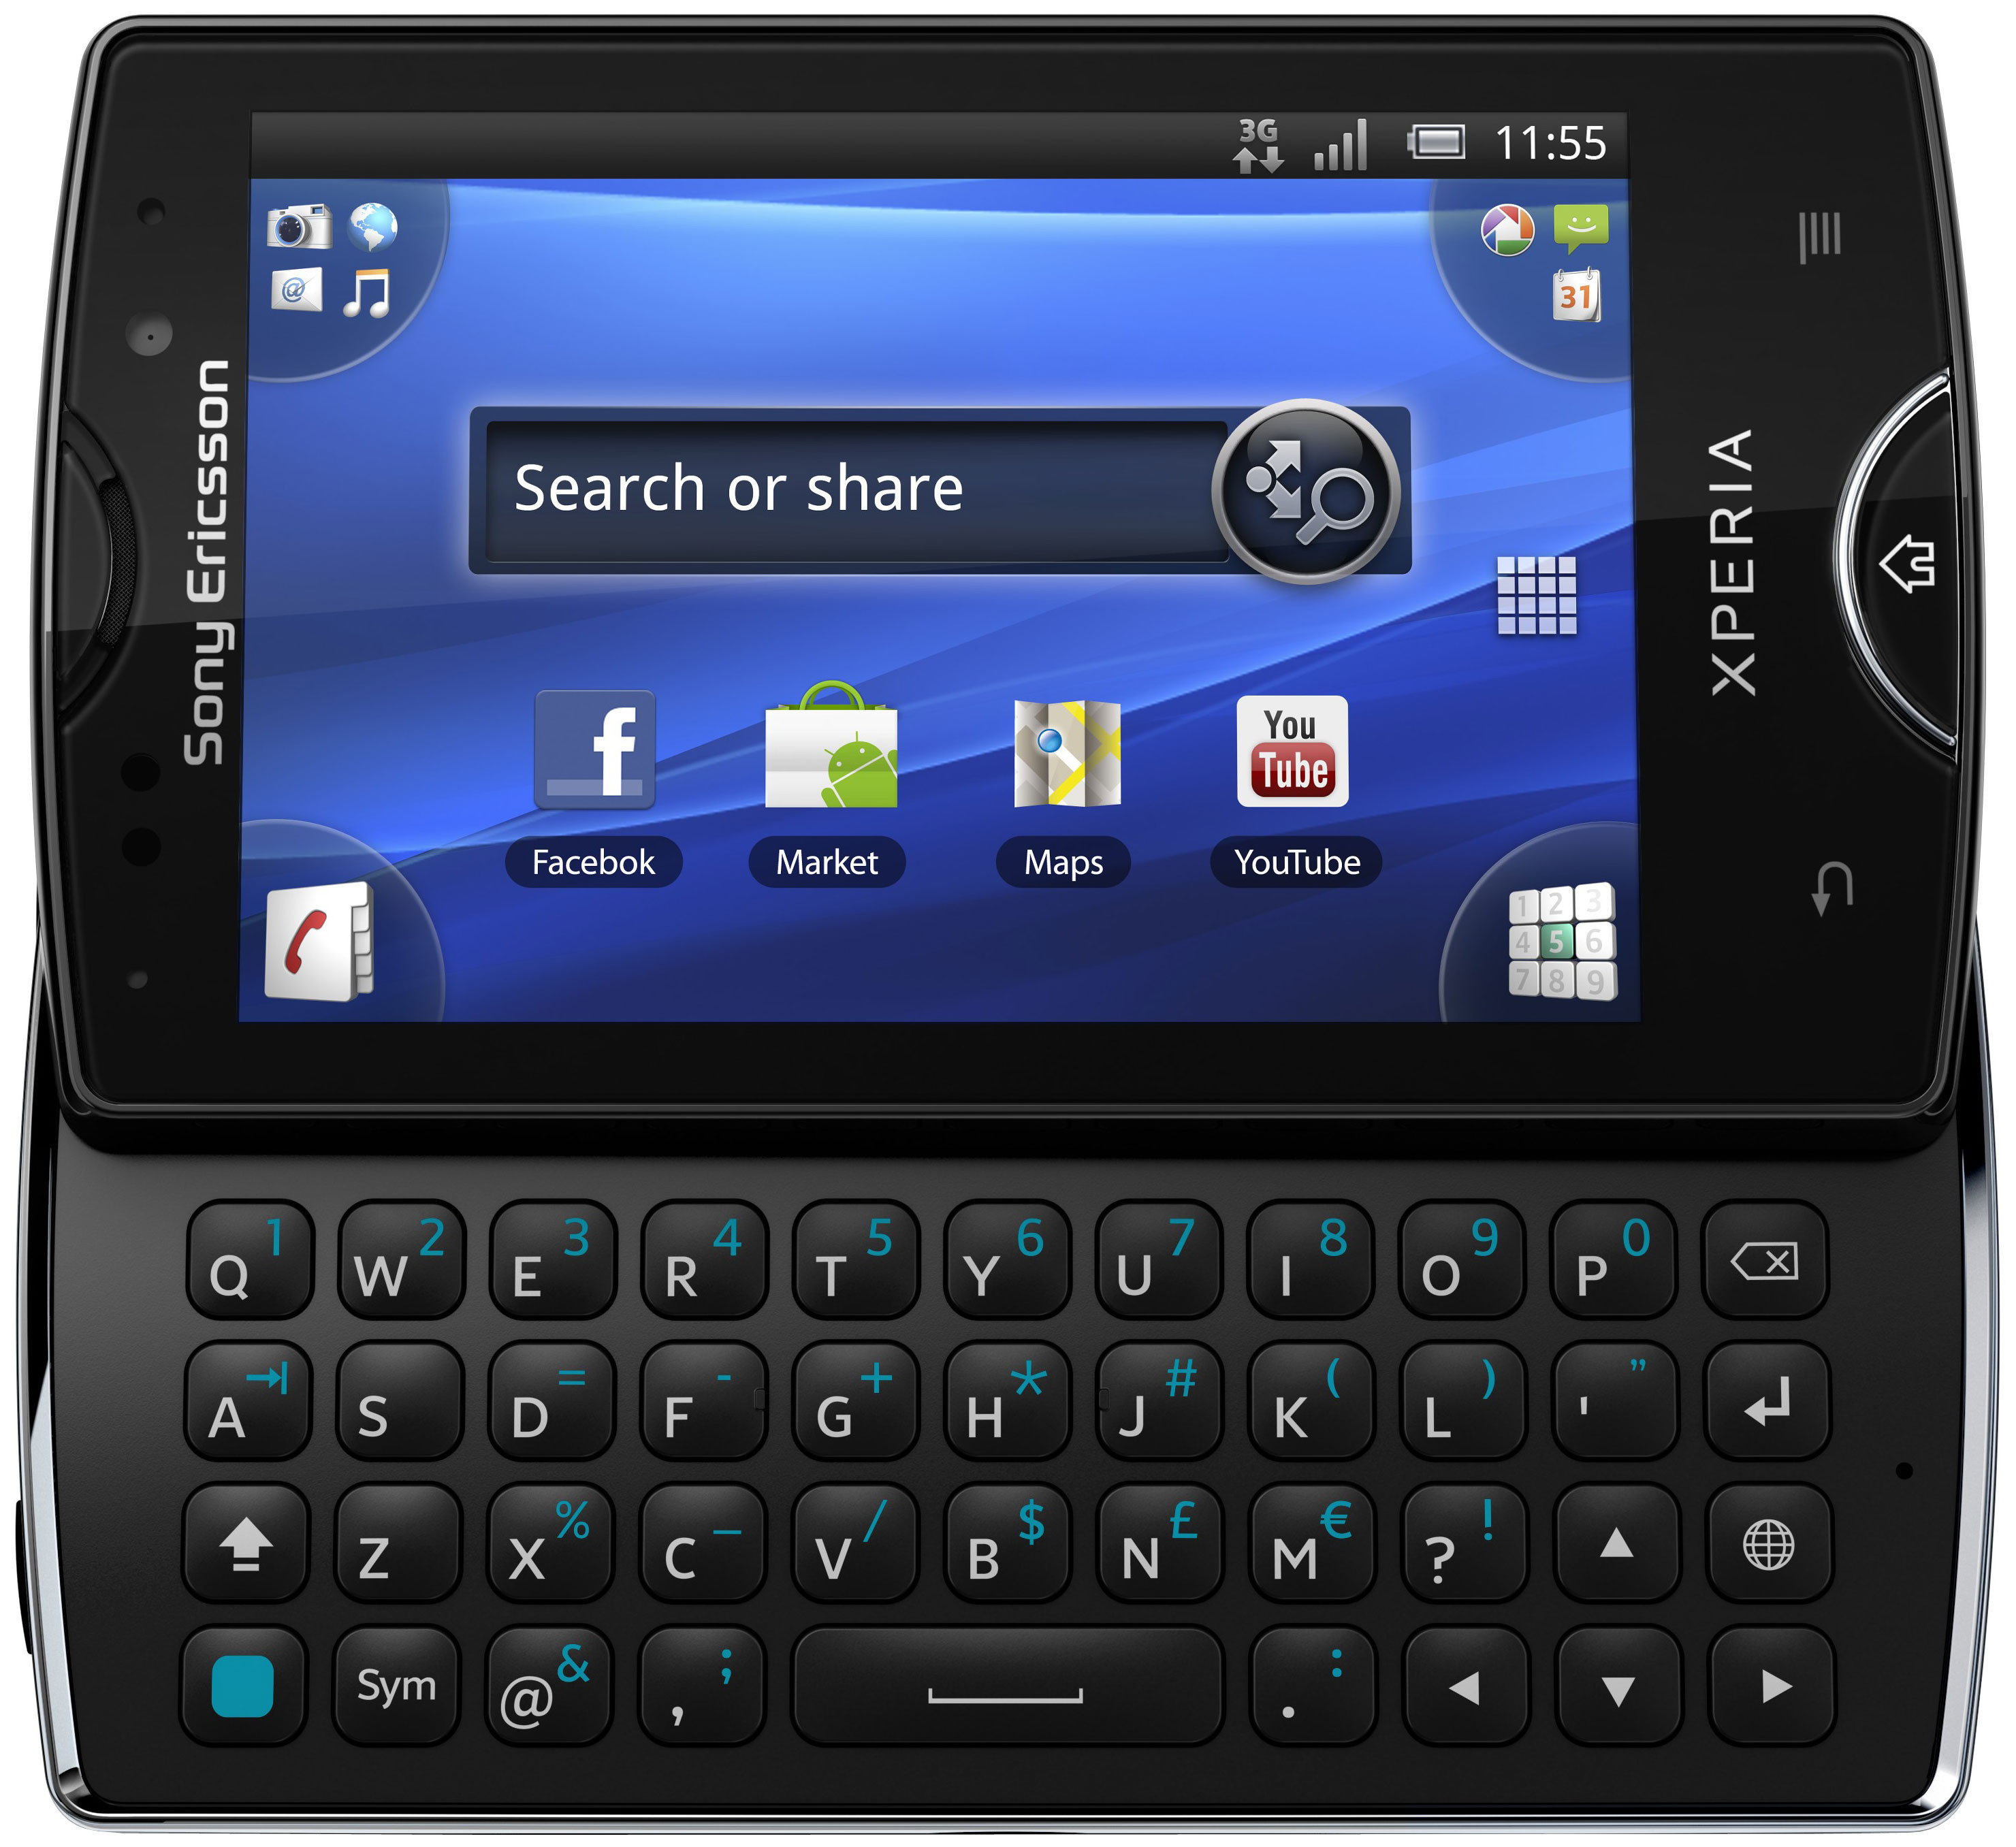 Sony Ericsson Xperia Mini Pro Black